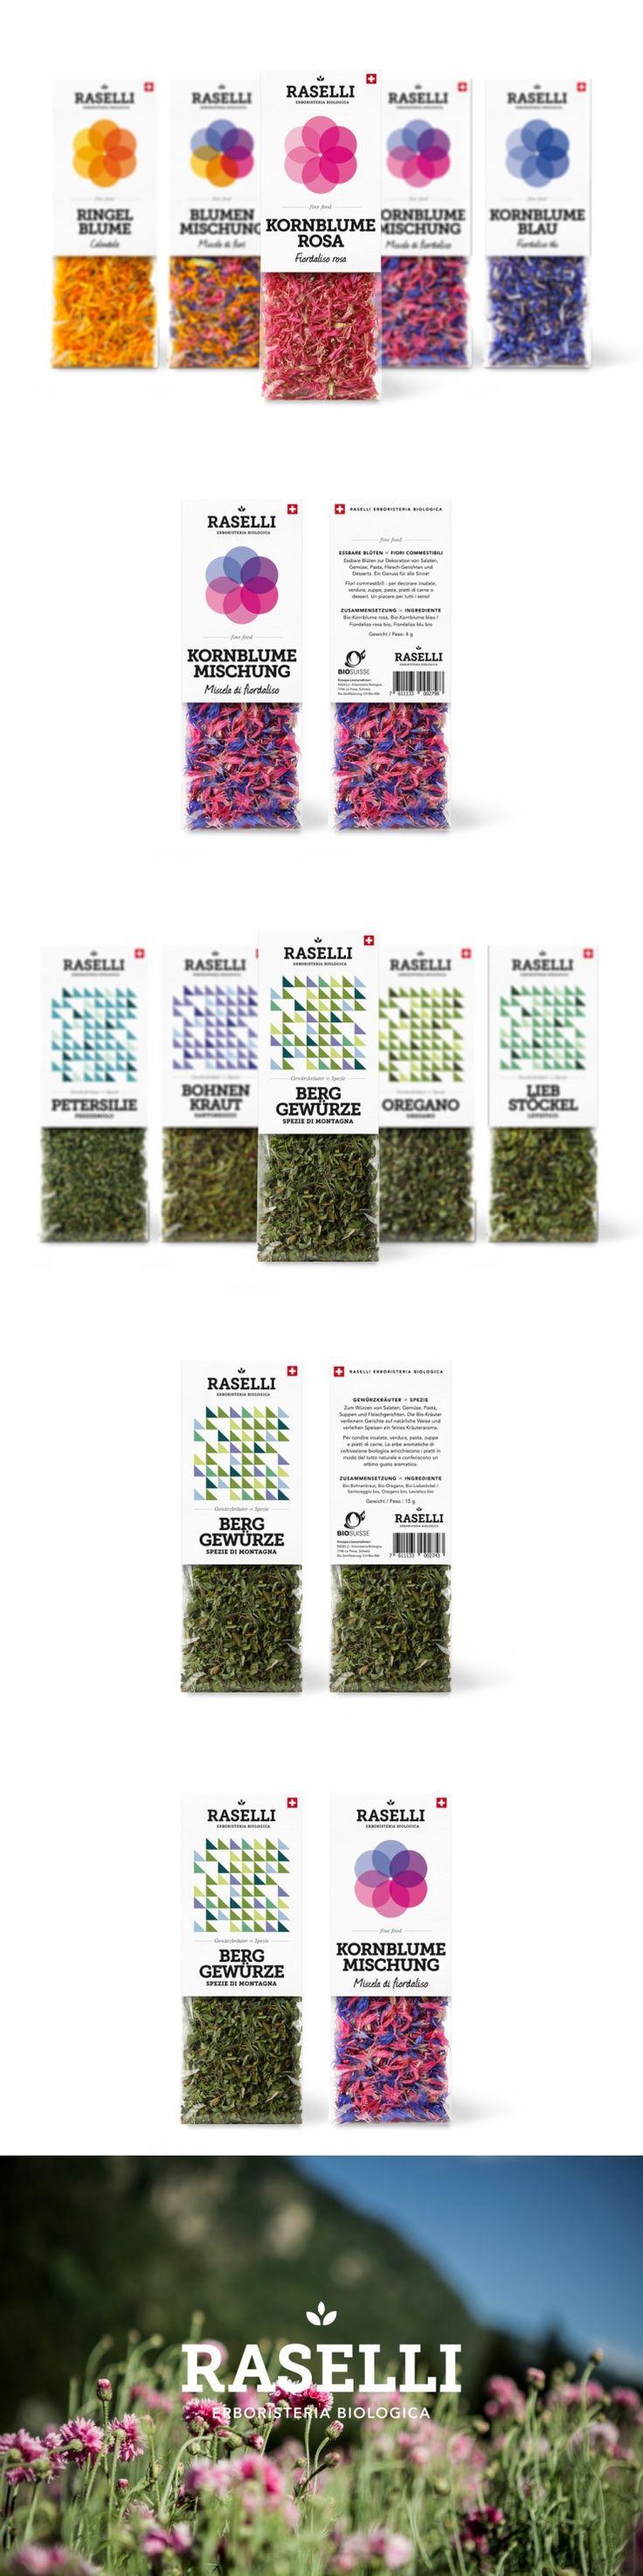 Raselli Organic Herbs & Blossoms — The Dieline   Packaging & Branding Design & Innovation News